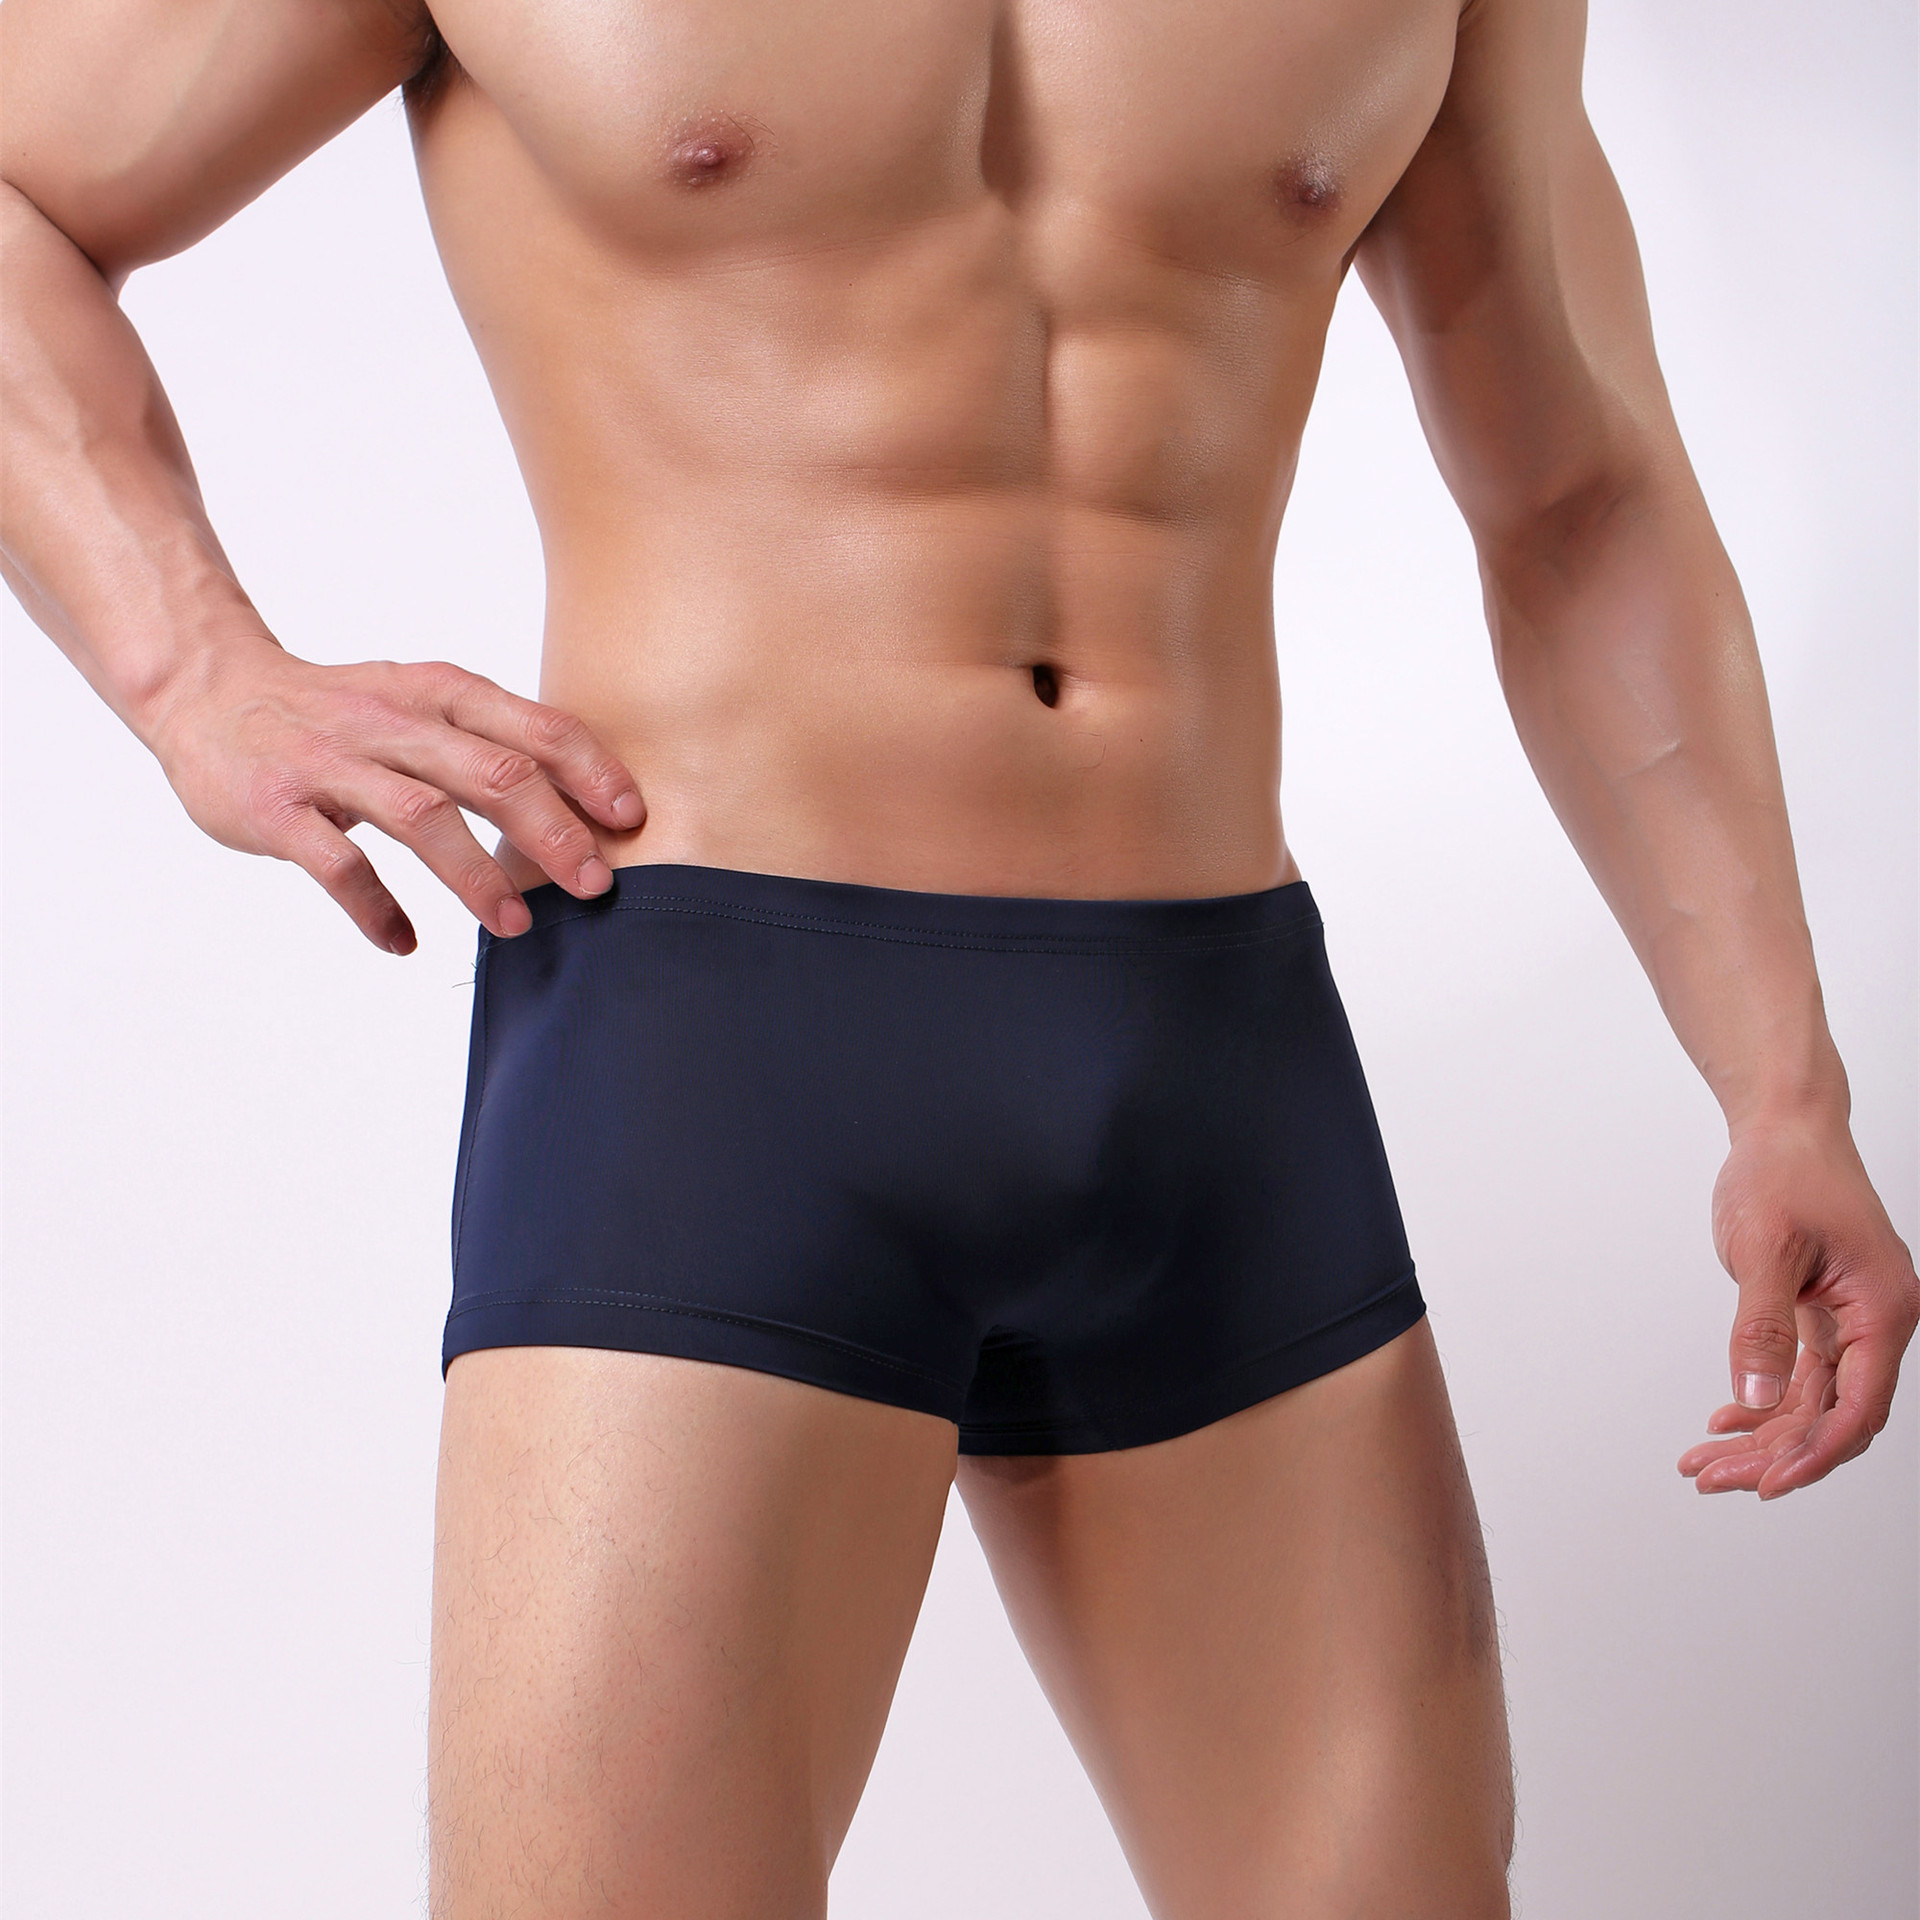 Men Summer Silky U Convex Men Pants Shorts Design Swimming Trunks Men Ice Silk Short